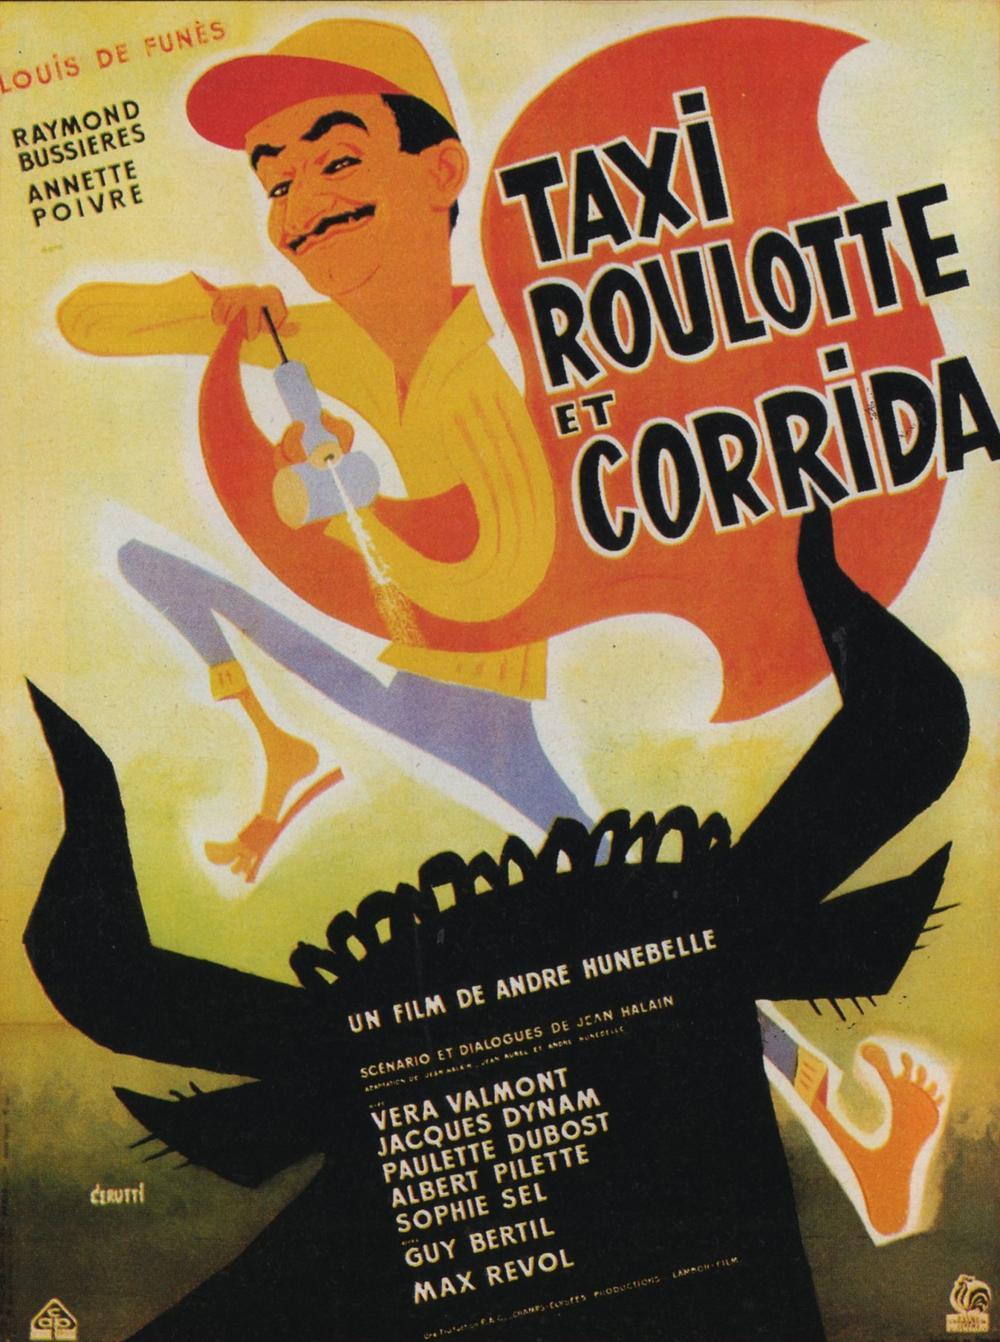 Affiche-Taxi-roulotte-corrida